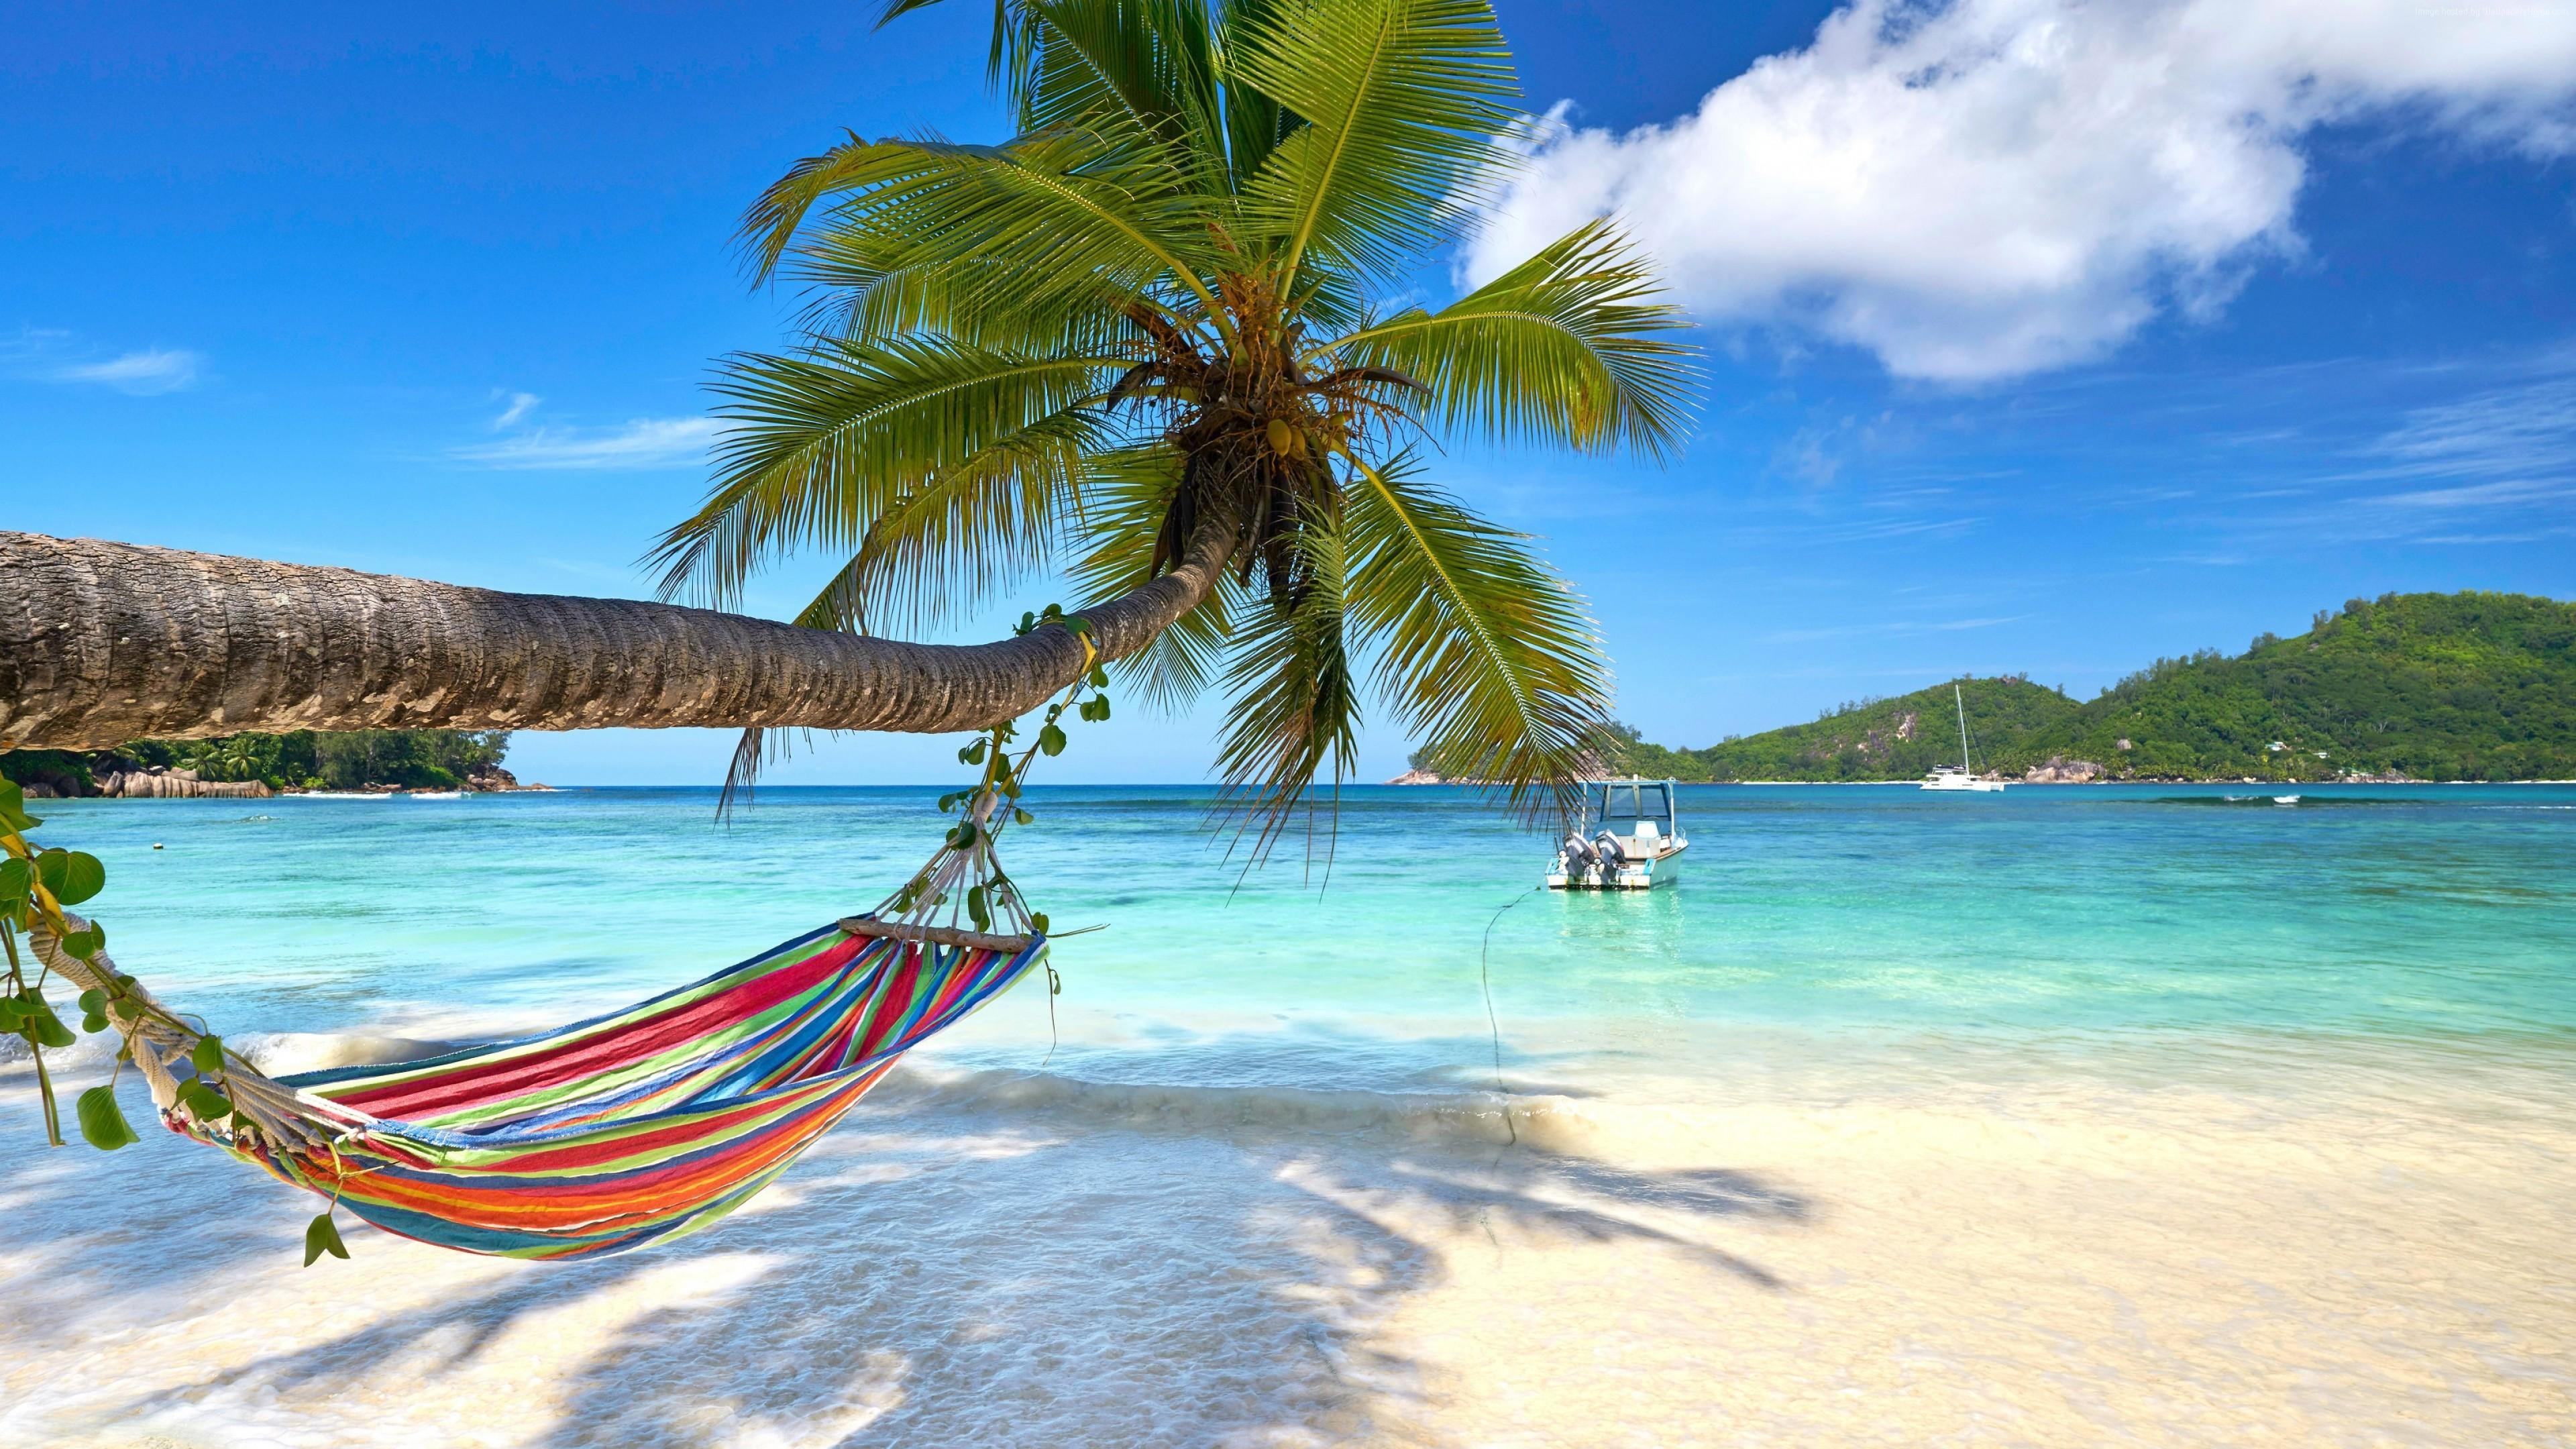 Wallpaper Turquoise, beach, palm, 4K, Travel Wallpaper ...